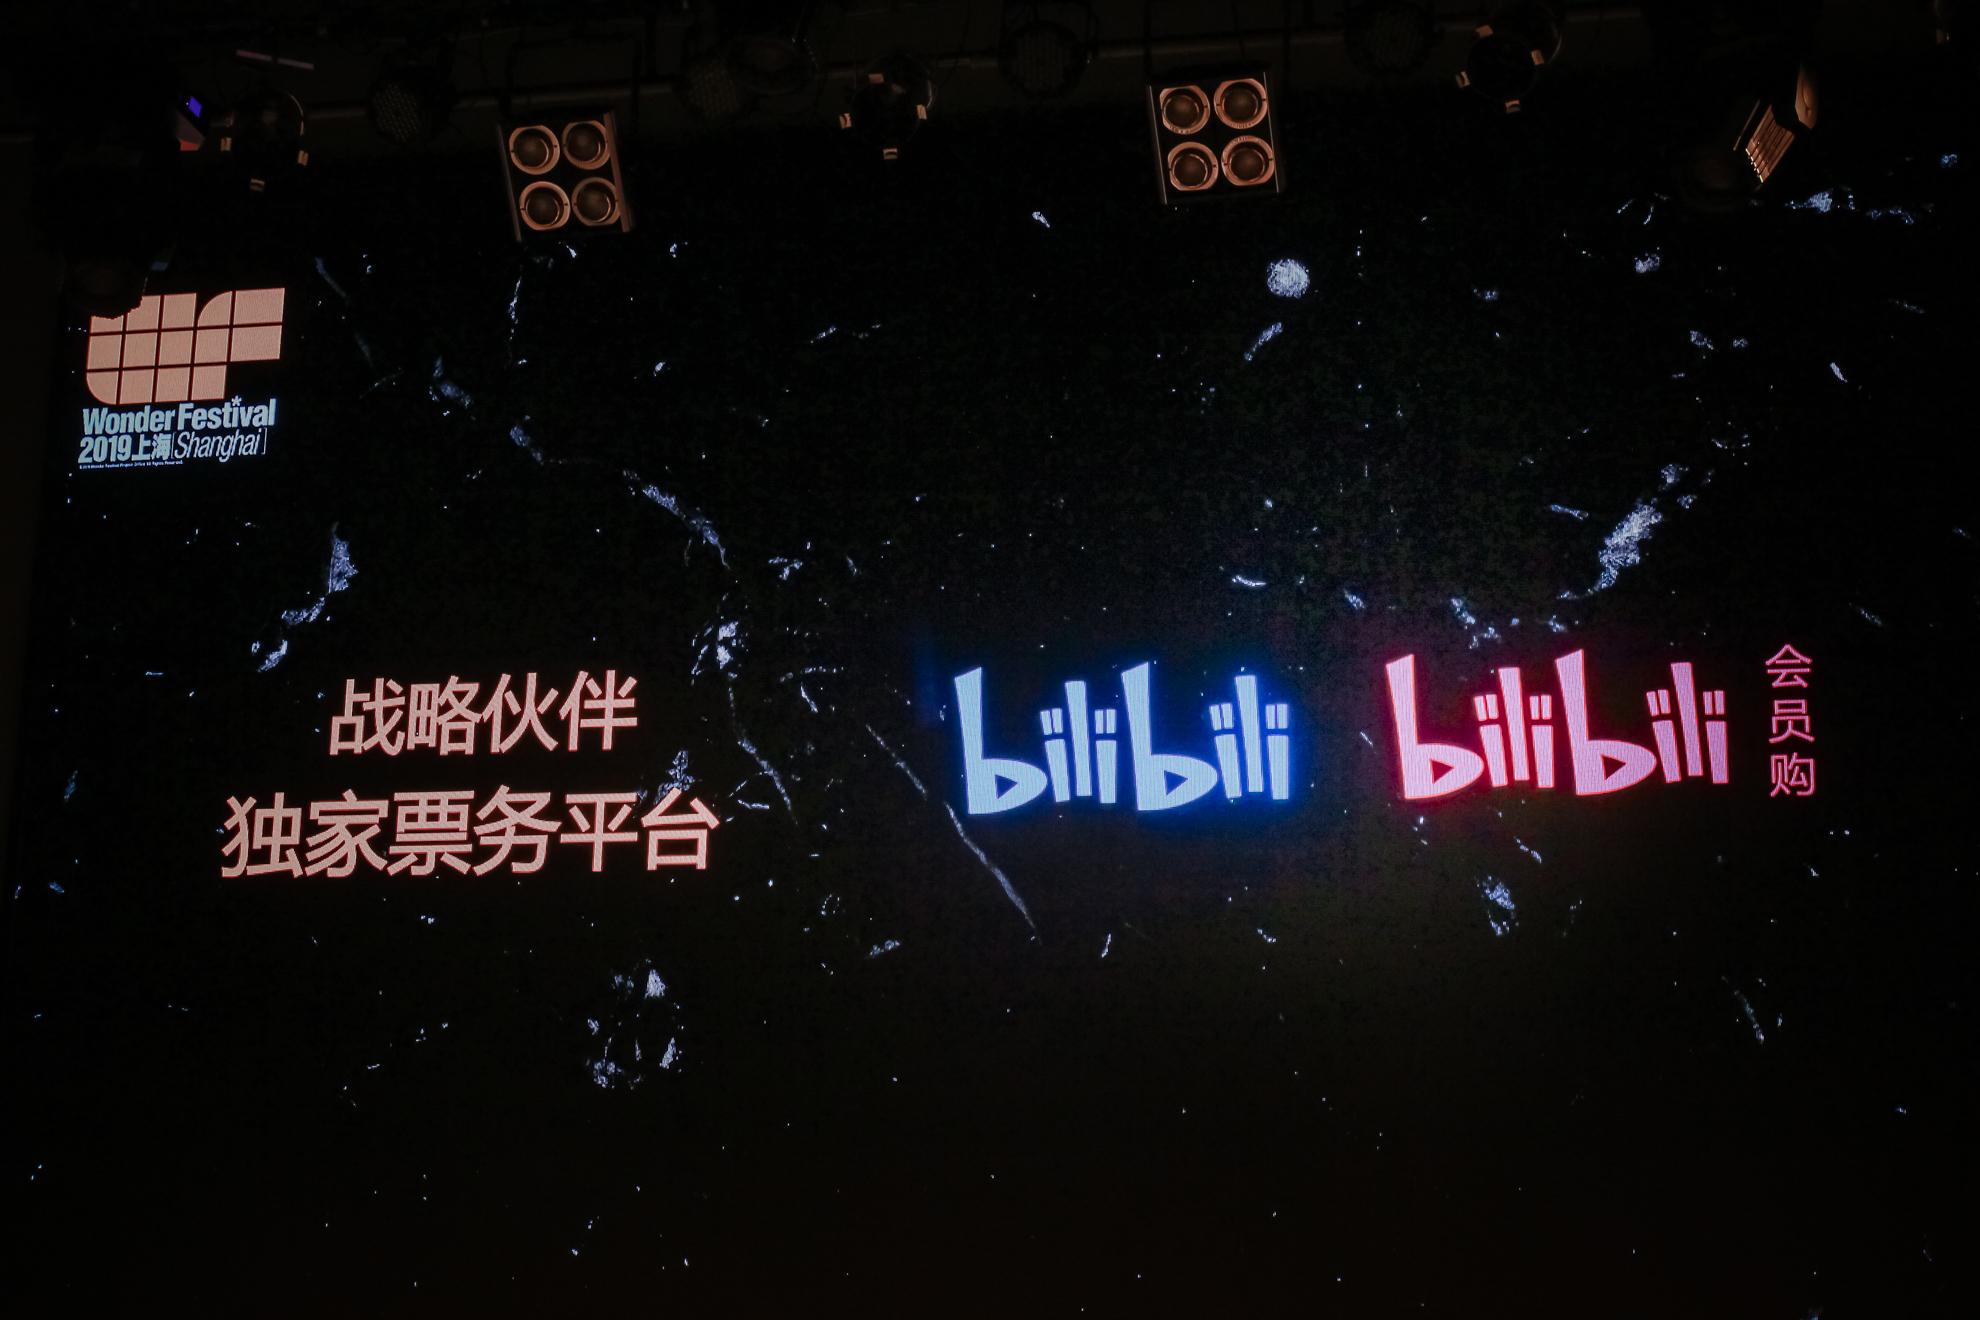 Wonder Festival,WF,世界级别手办展览